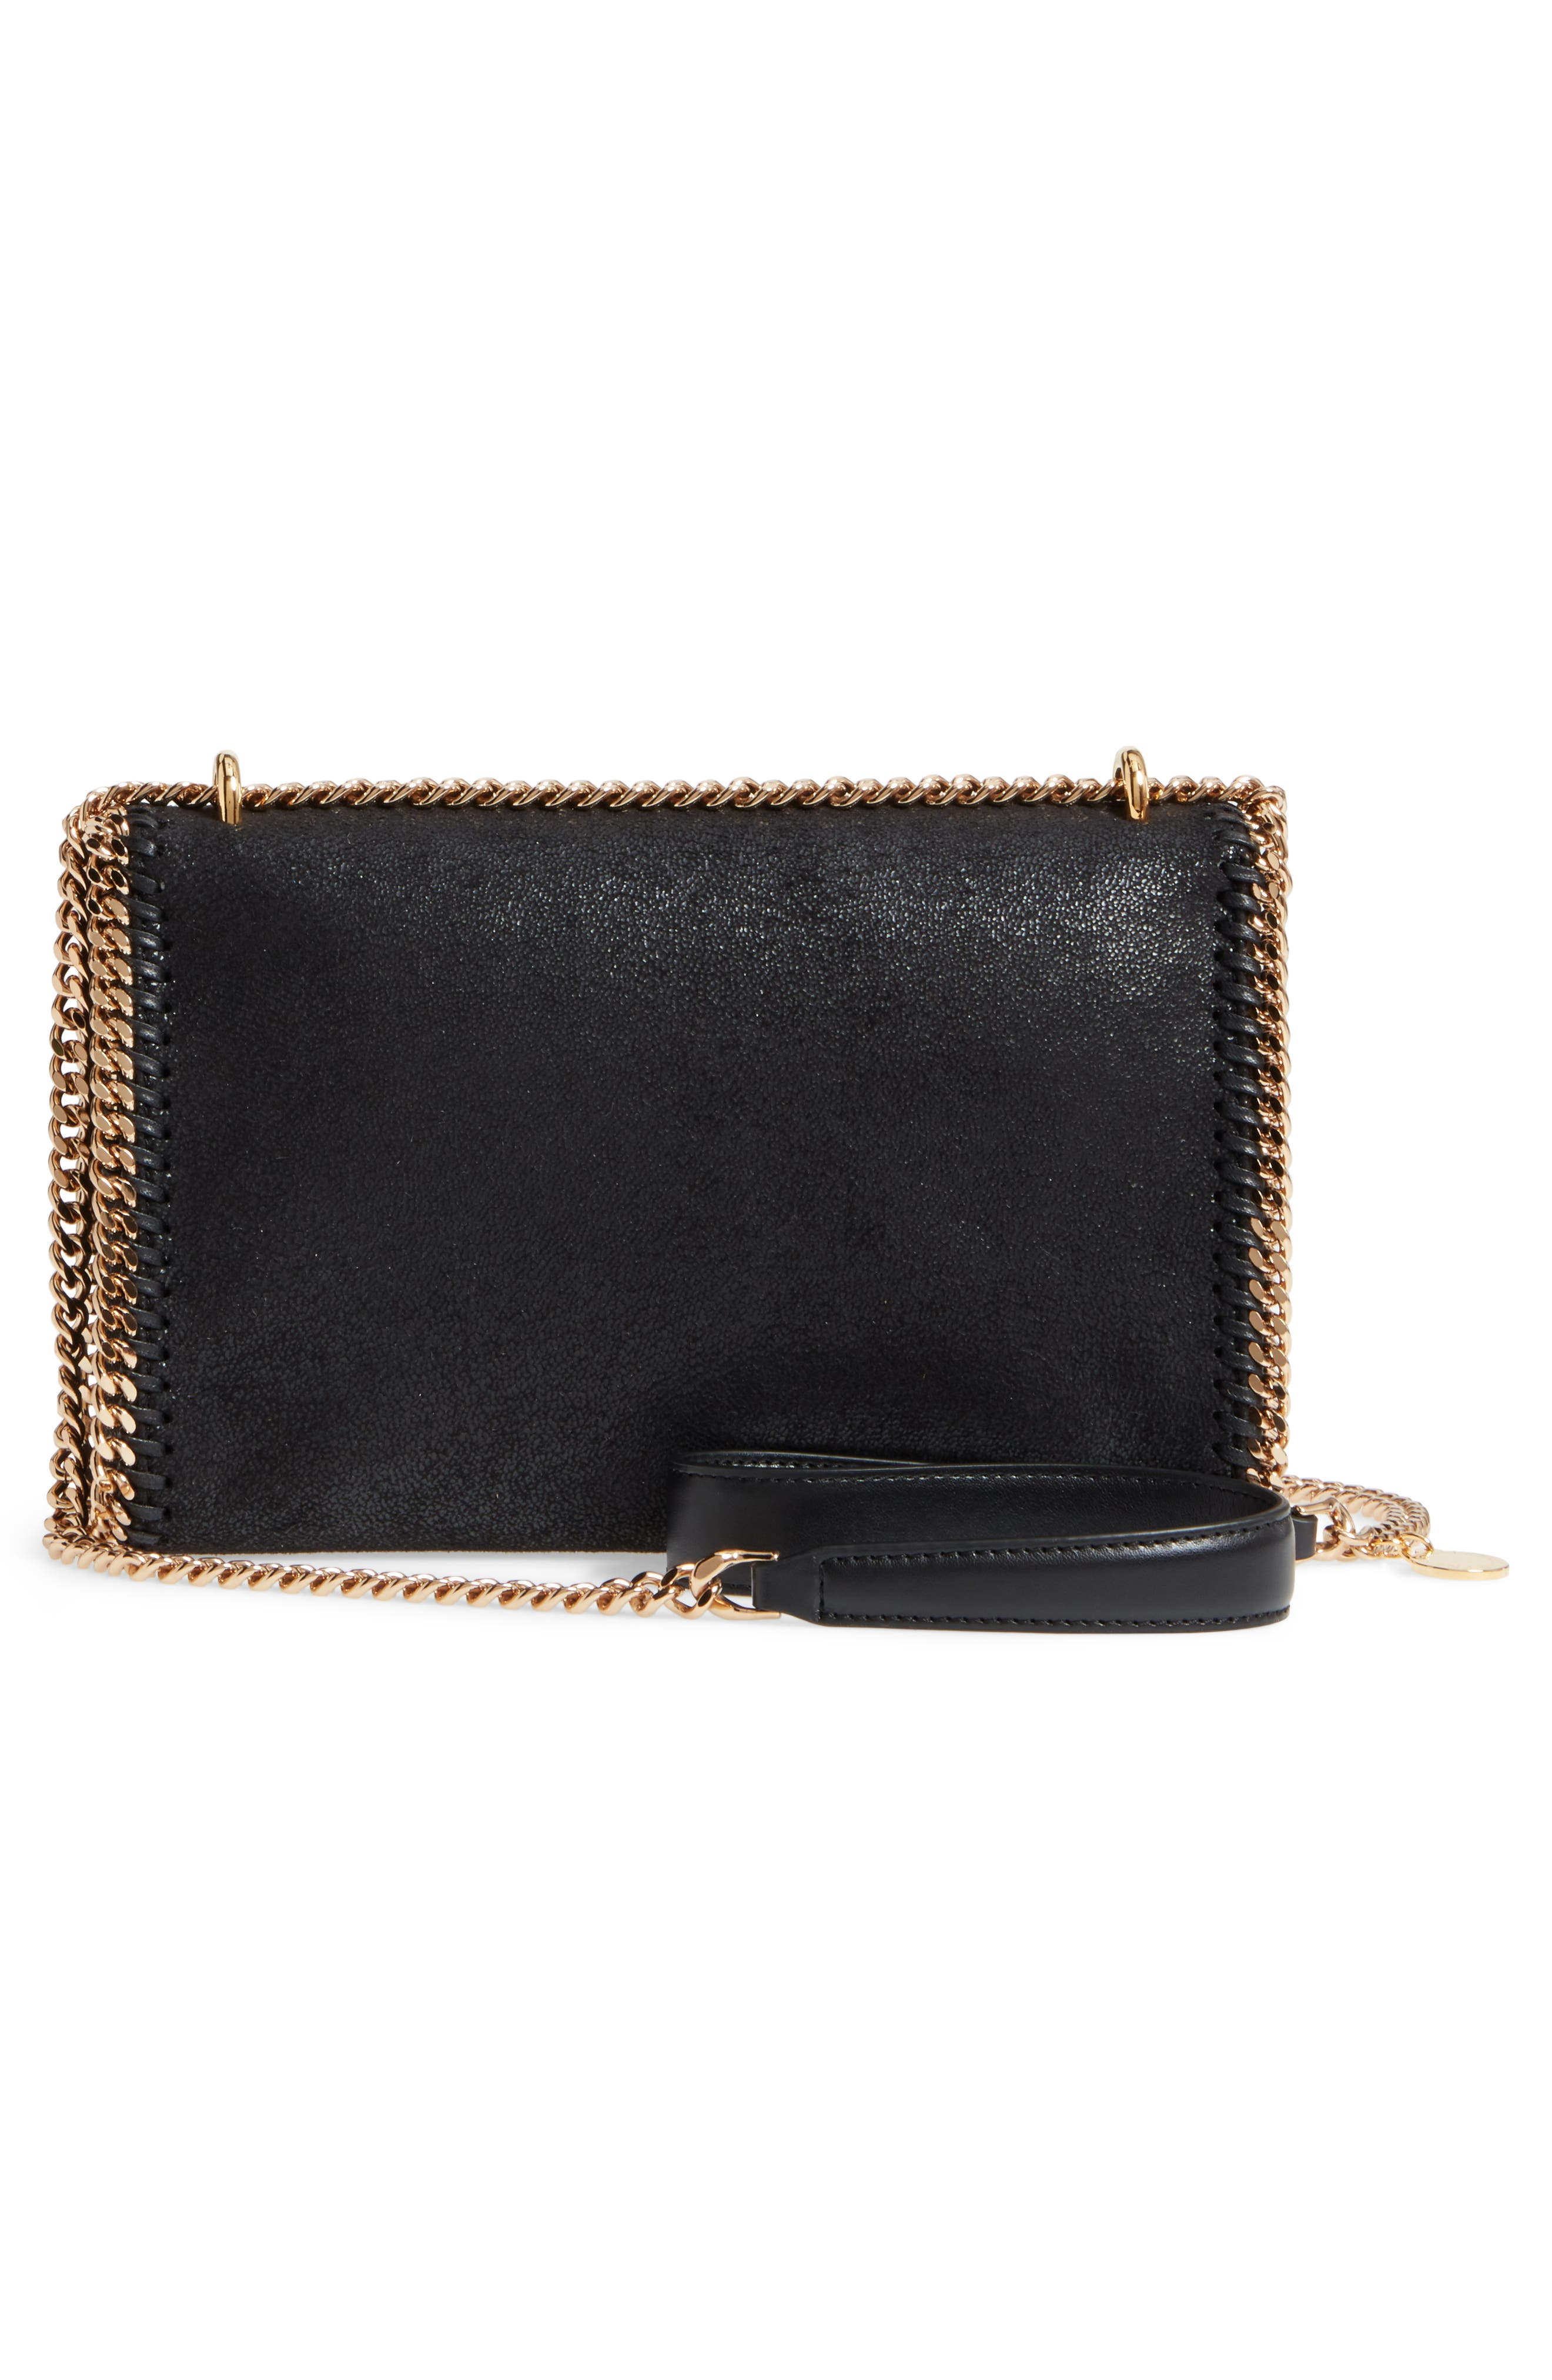 Falabella Shaggy Deer Faux Leather Shoulder Bag,                             Alternate thumbnail 3, color,                             BLACK